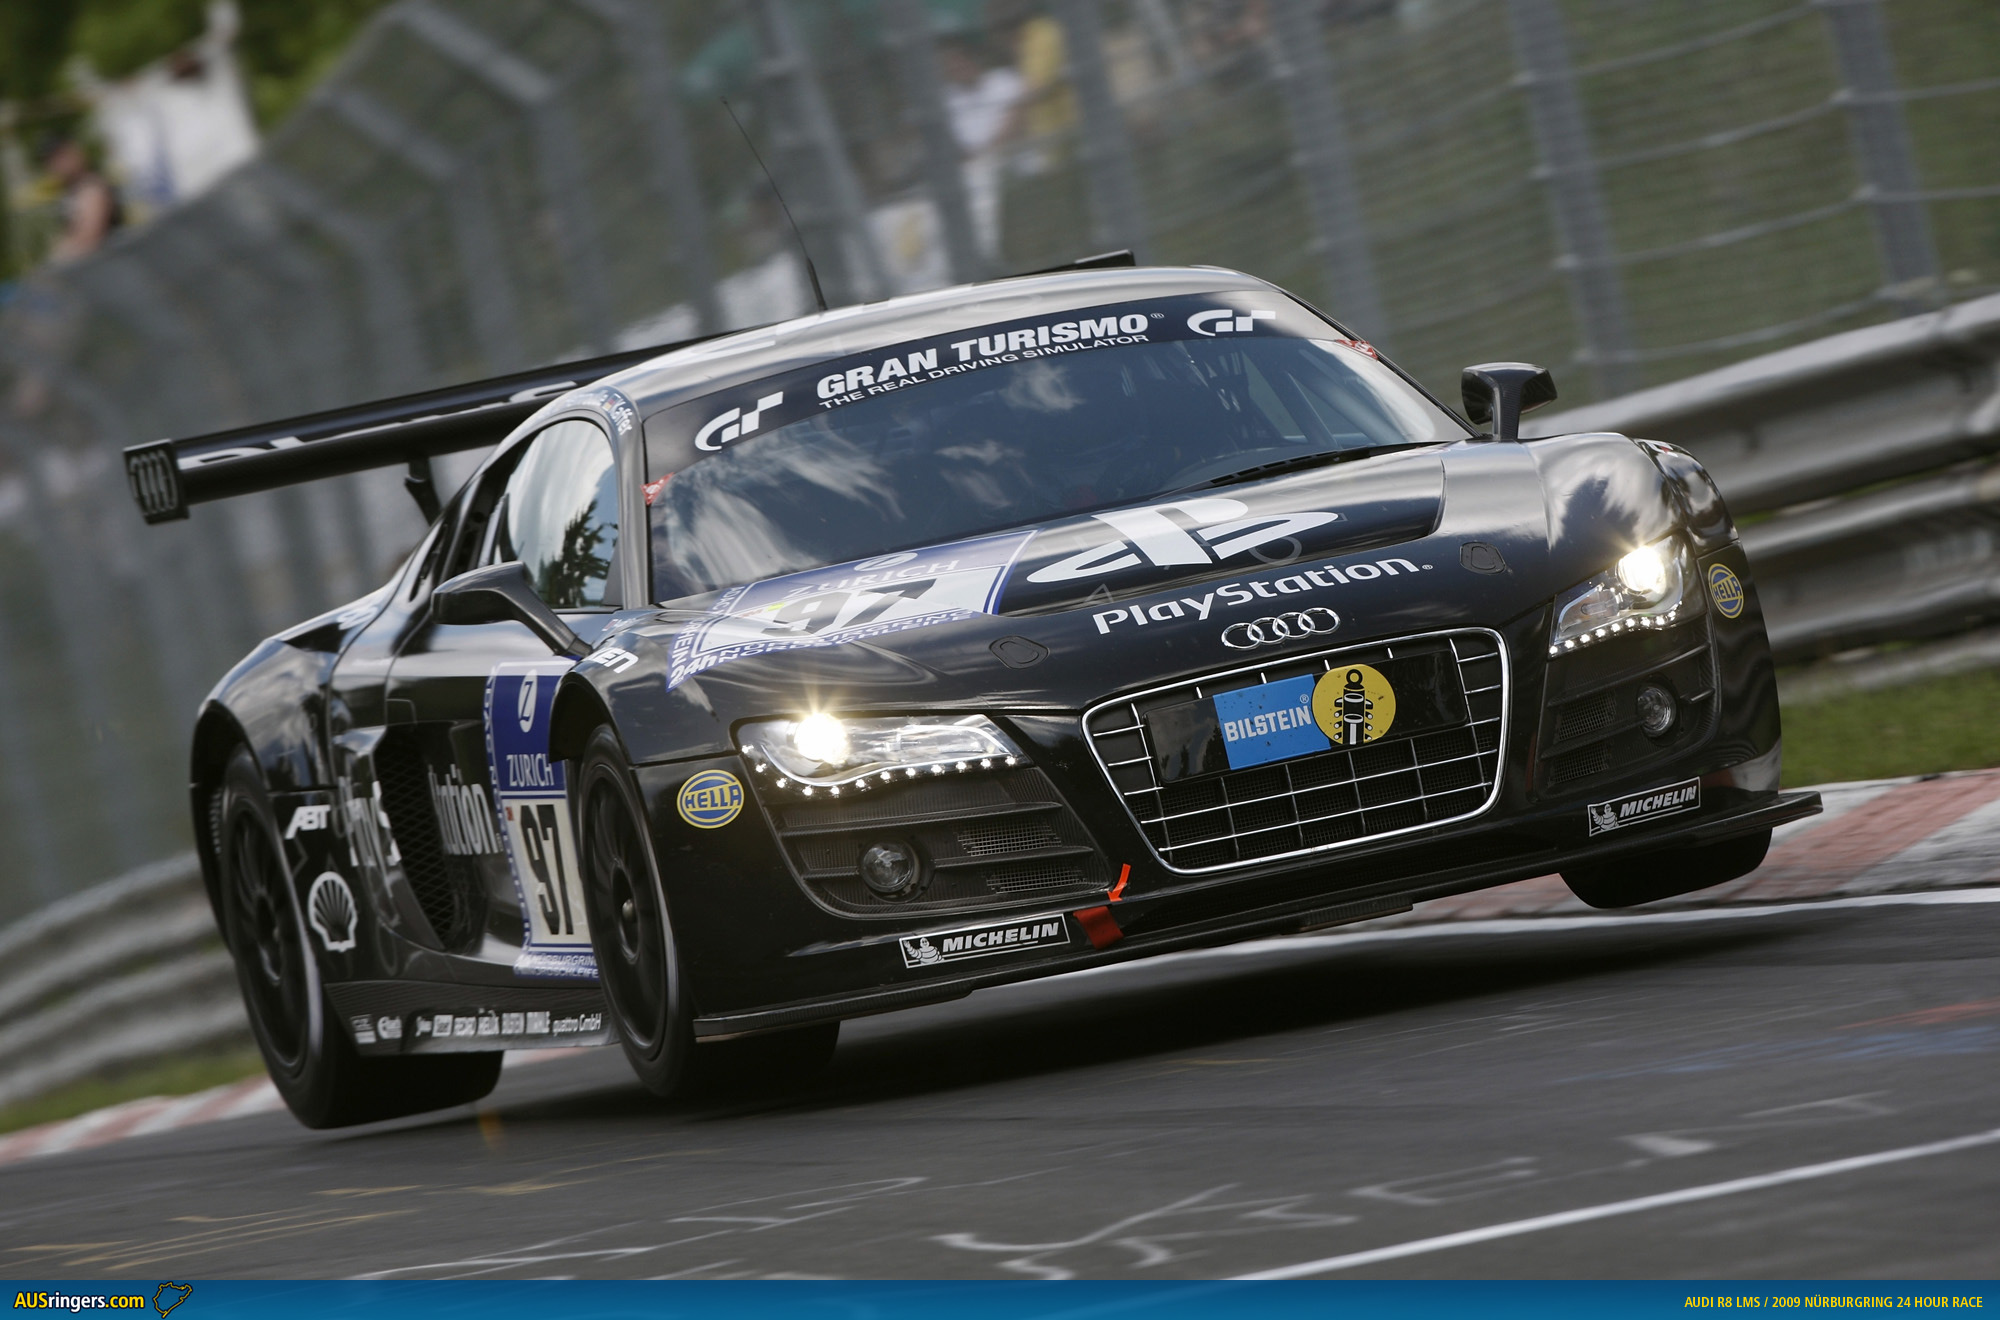 Audi GT3